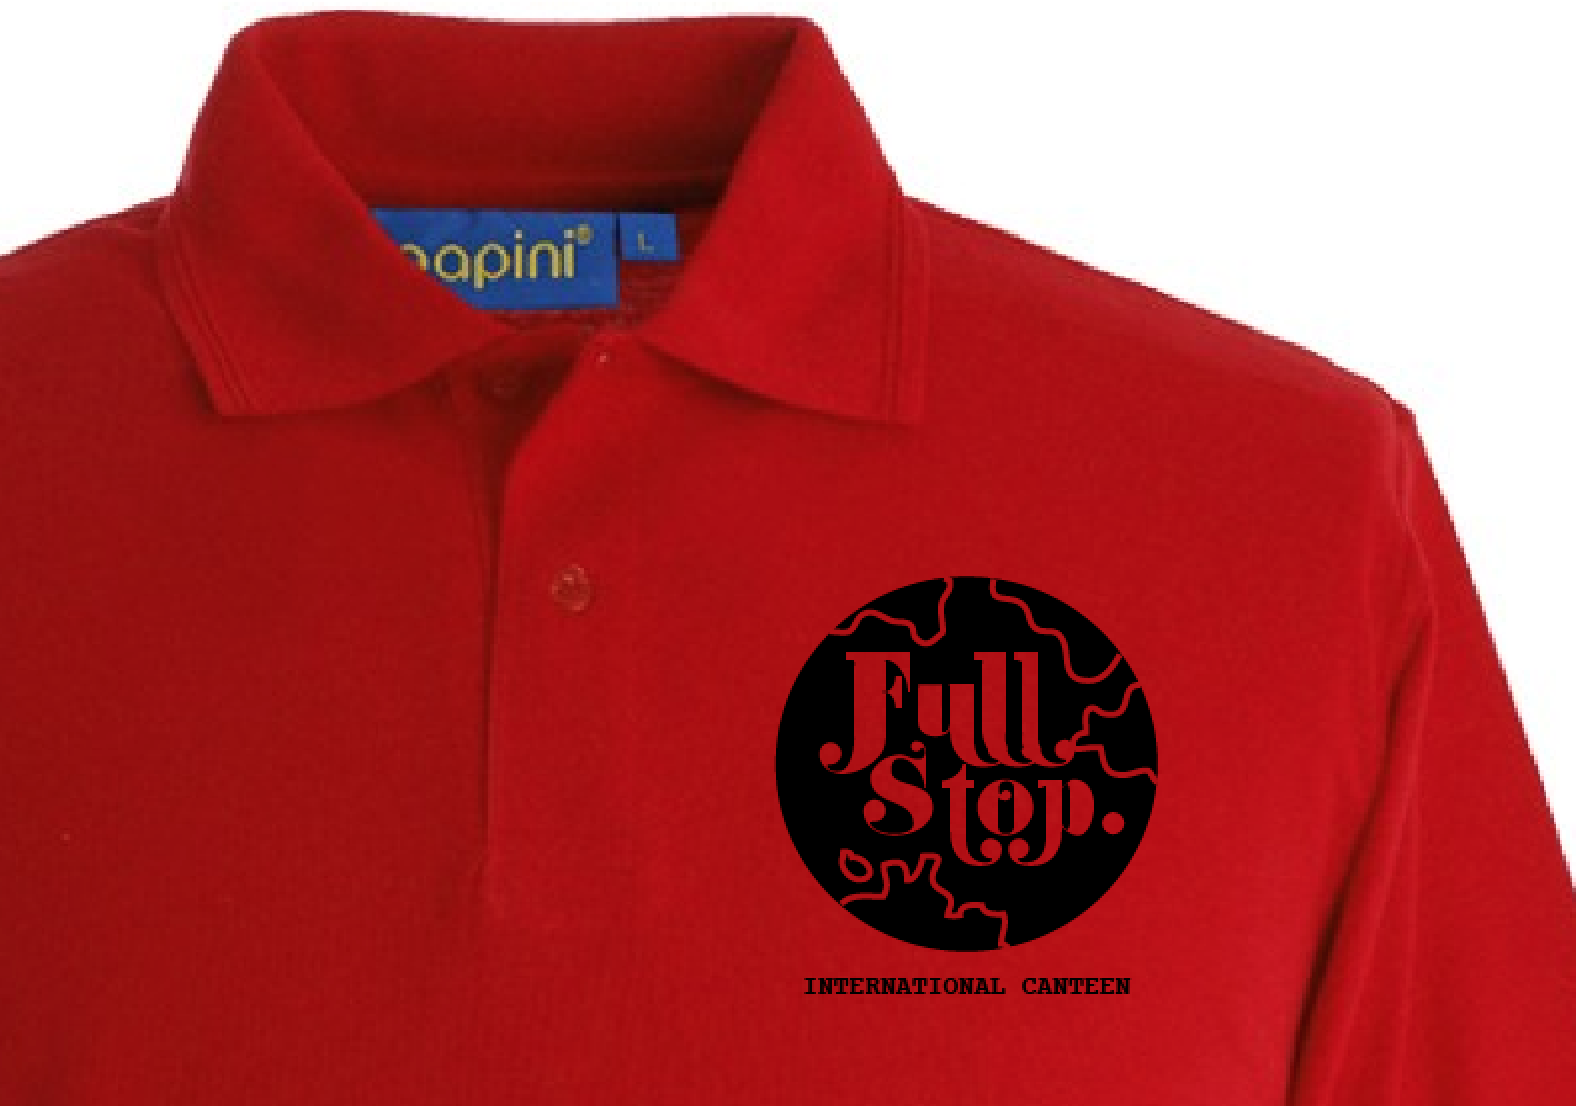 Design practice ougd504 design for print and web studio for Screen printing polo shirts